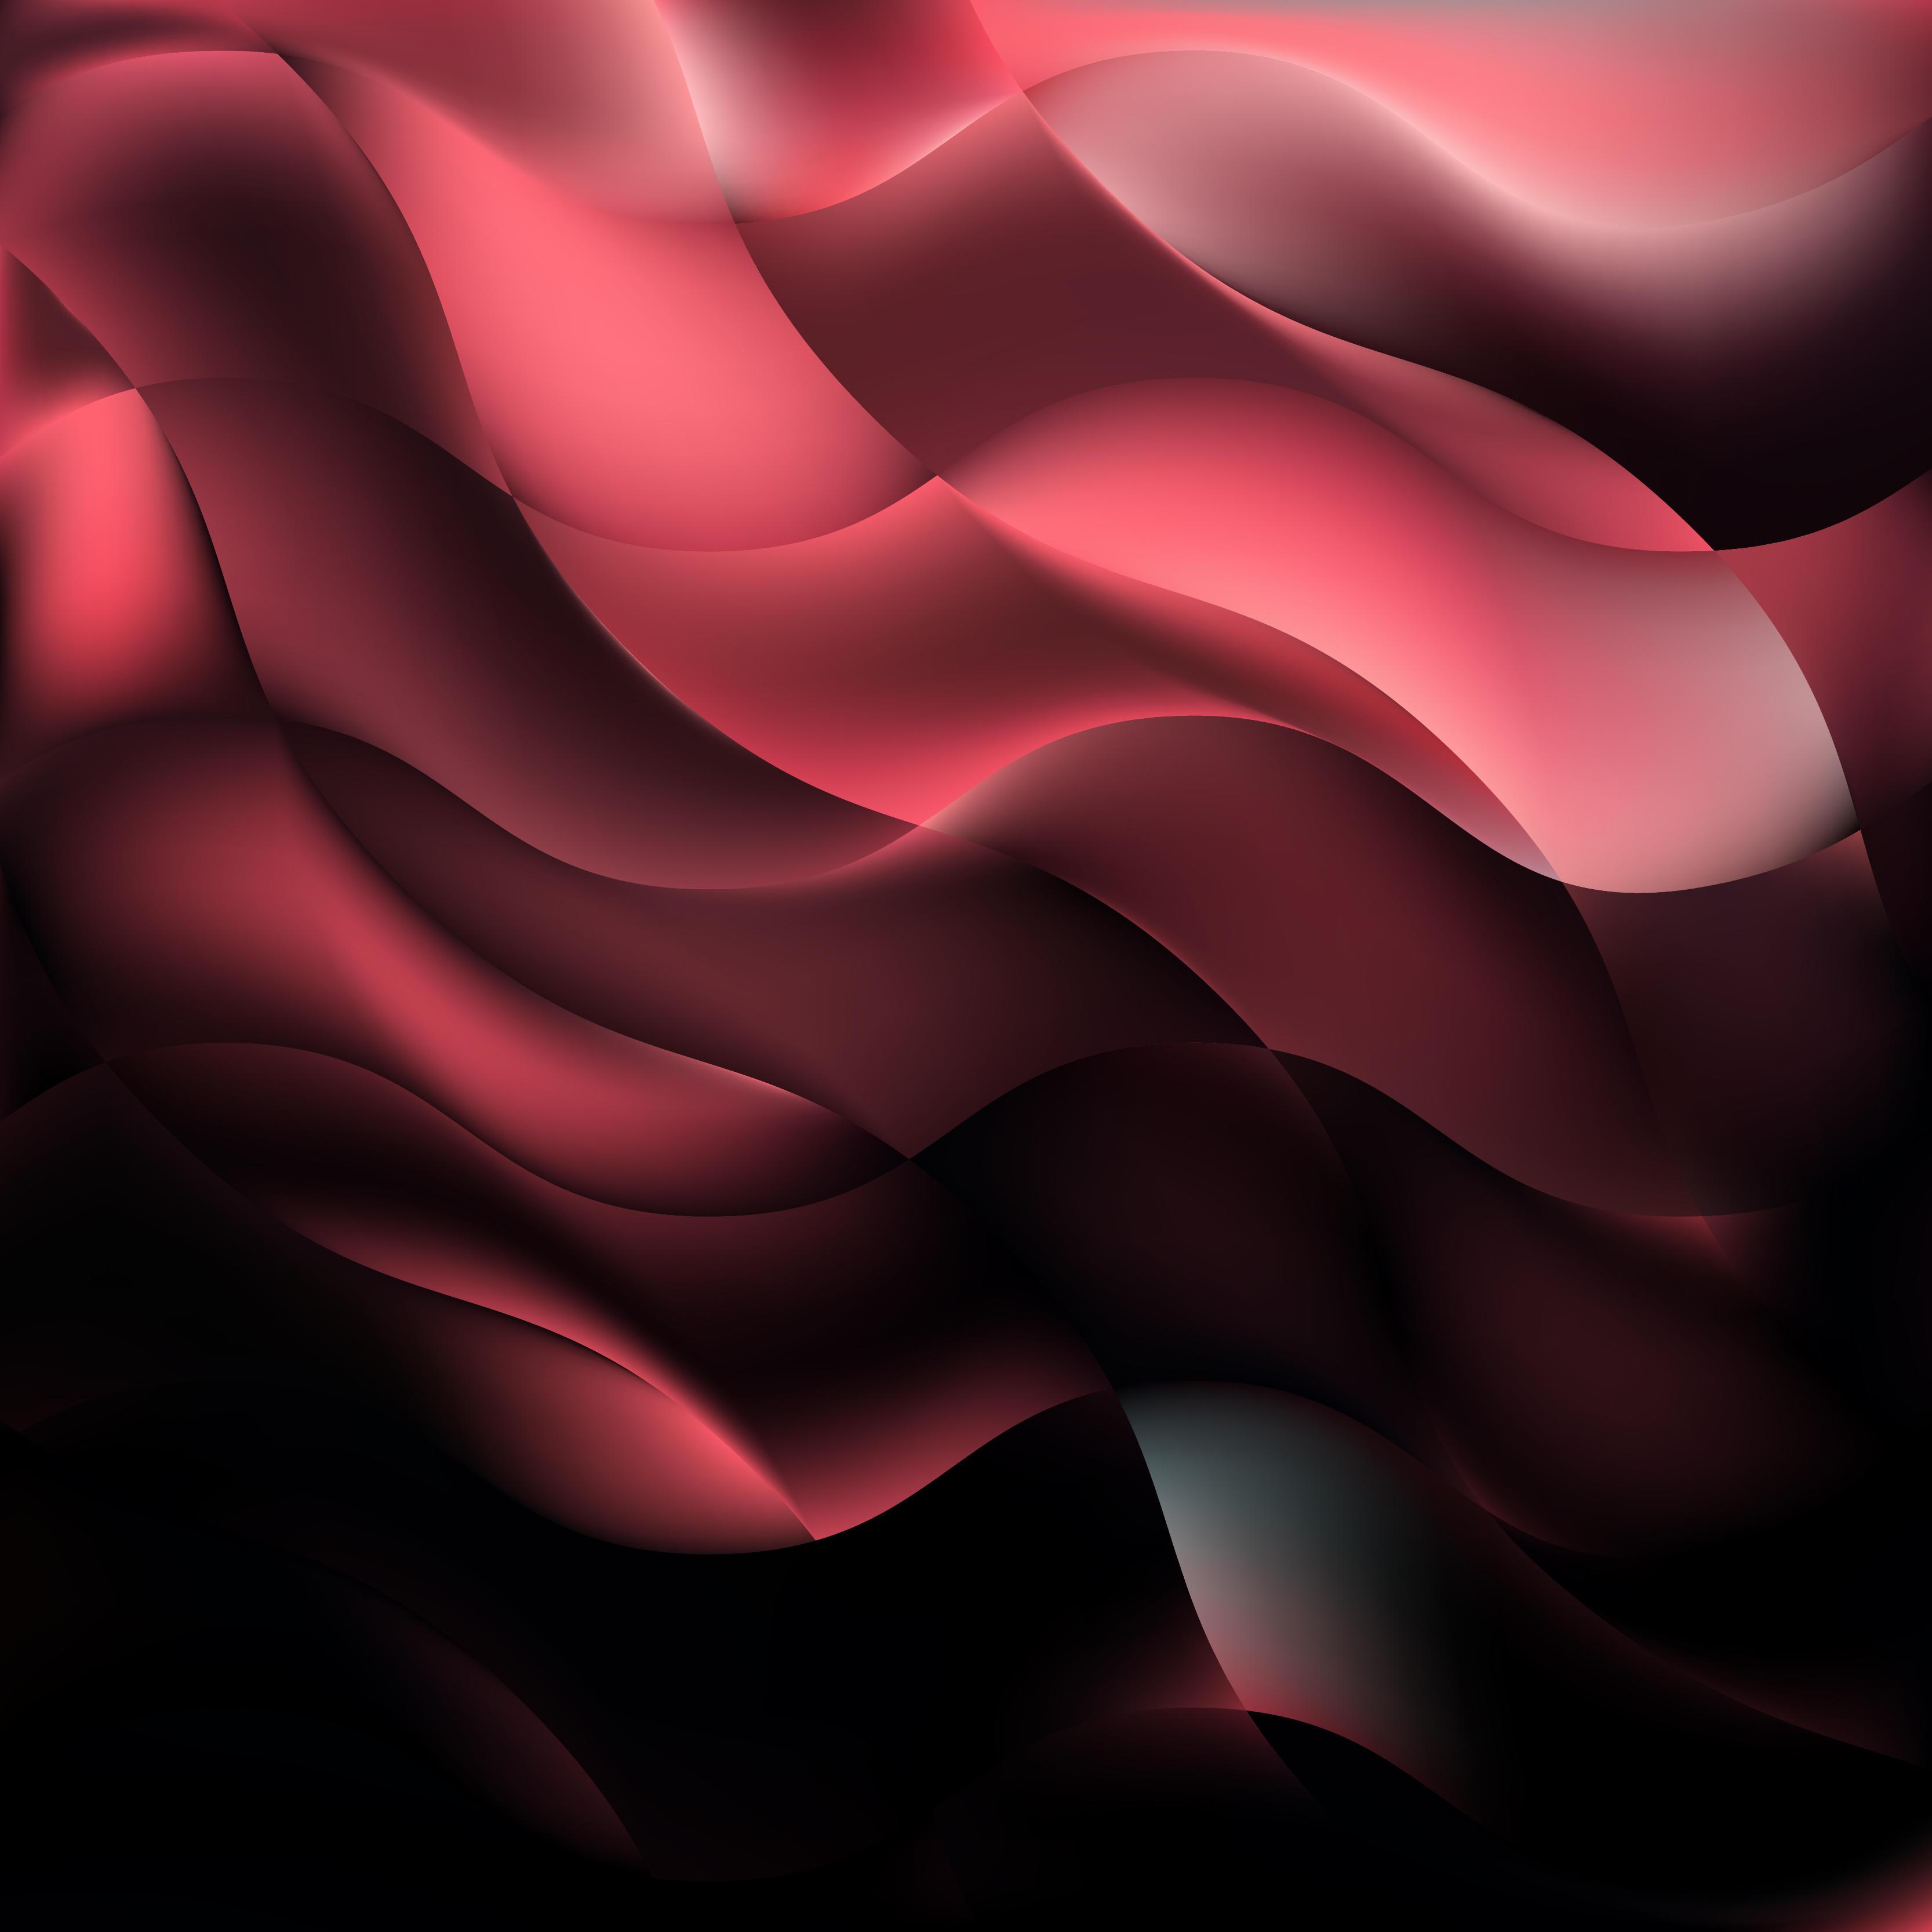 Wallpaper Black Pink: Background Pink Black